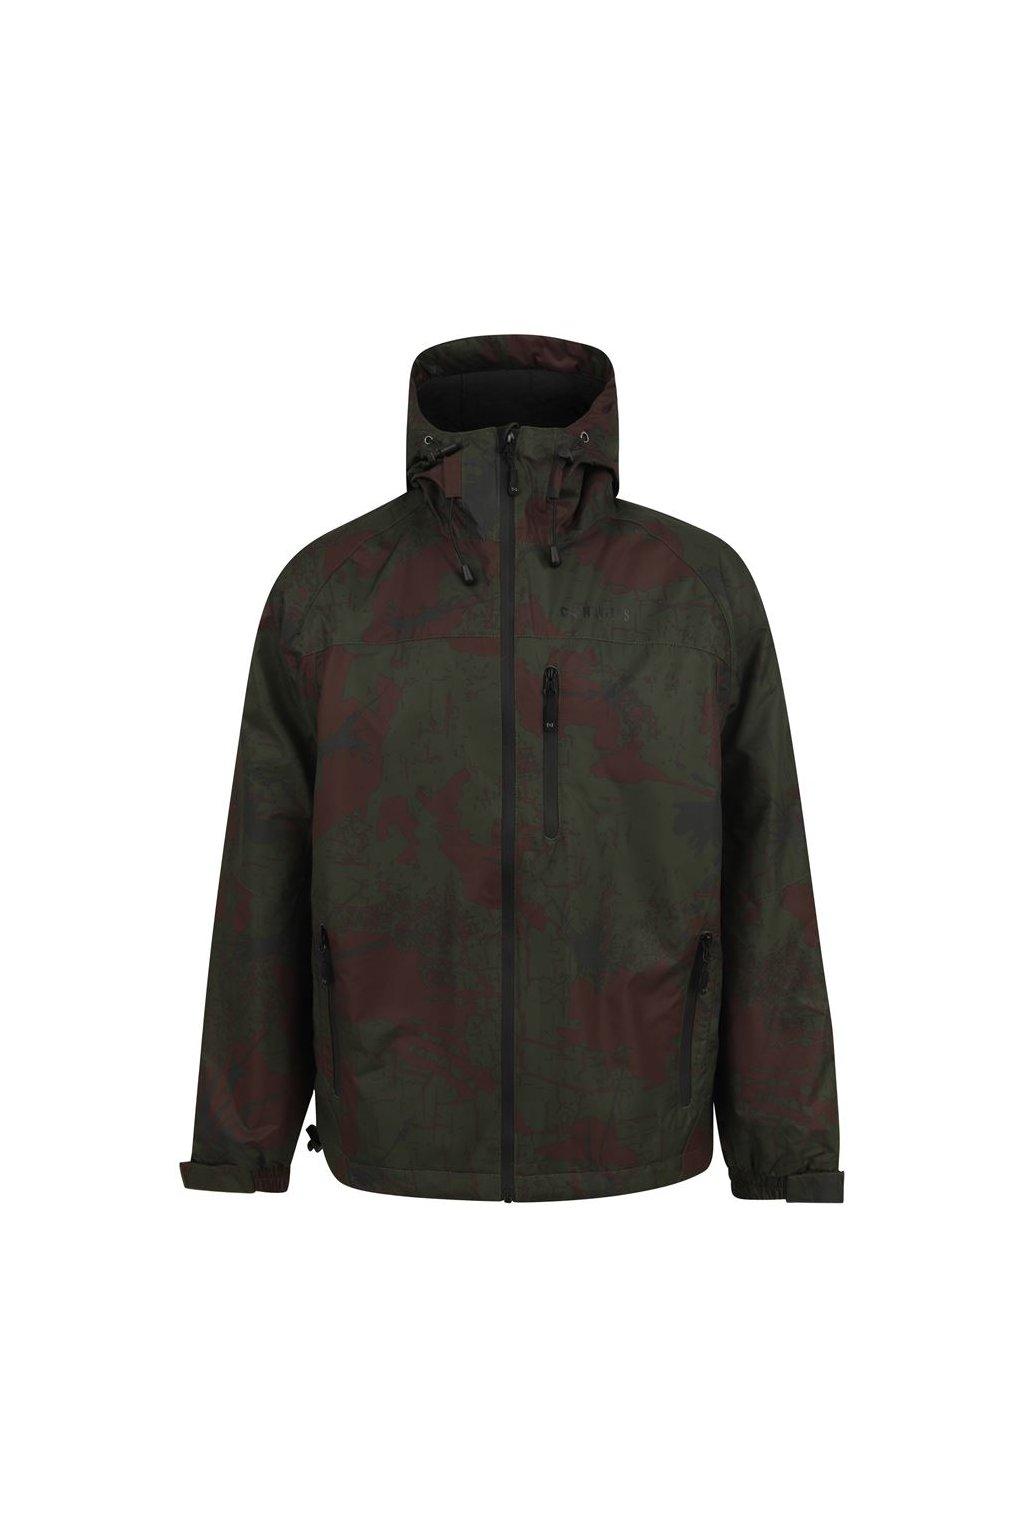 Navitas: Bunda Scout Jacket Camo 2.0 Velikost XL